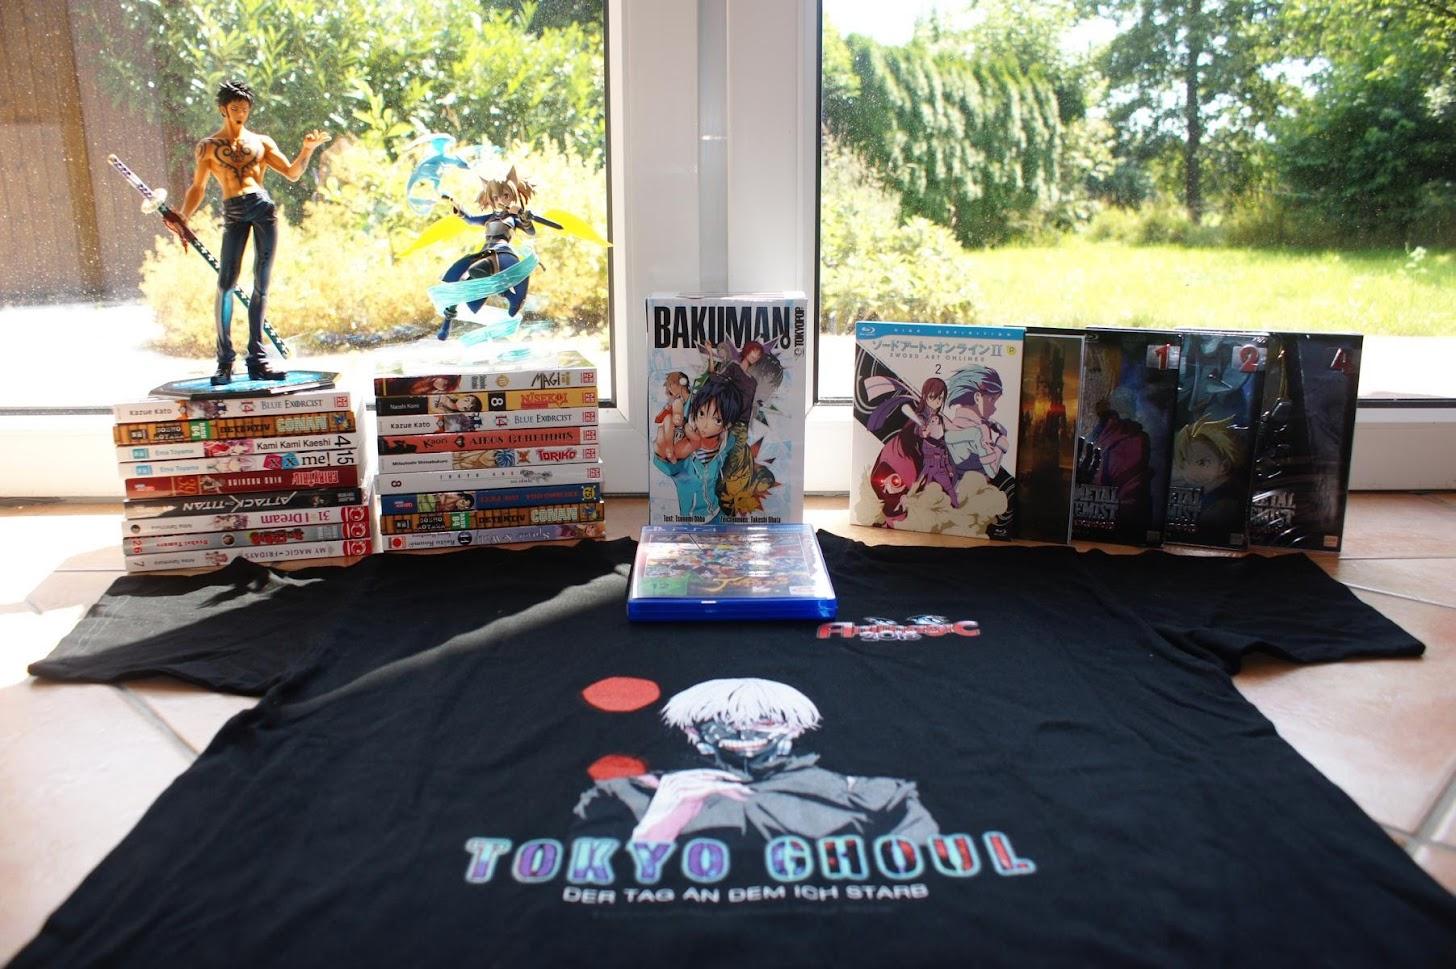 Loot Juli 2015 One Piece SAO Sword Art Online Tokyo Ghoul Fullmetal Alchemist Bakuman Animagic 2015